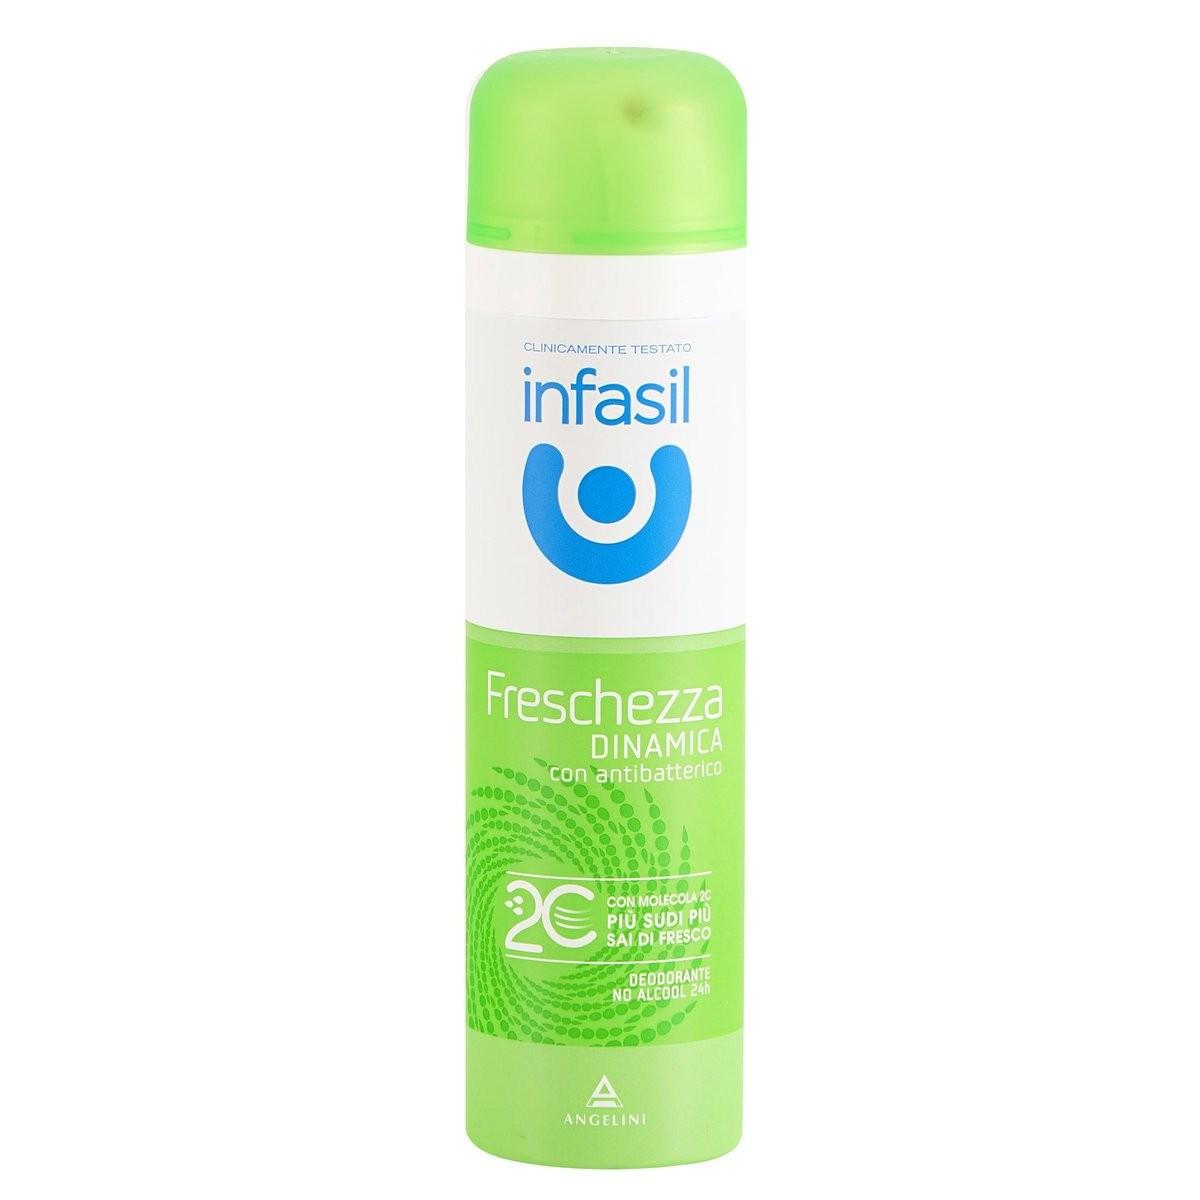 Infasil Deodorante spray Freschezza Dinamica